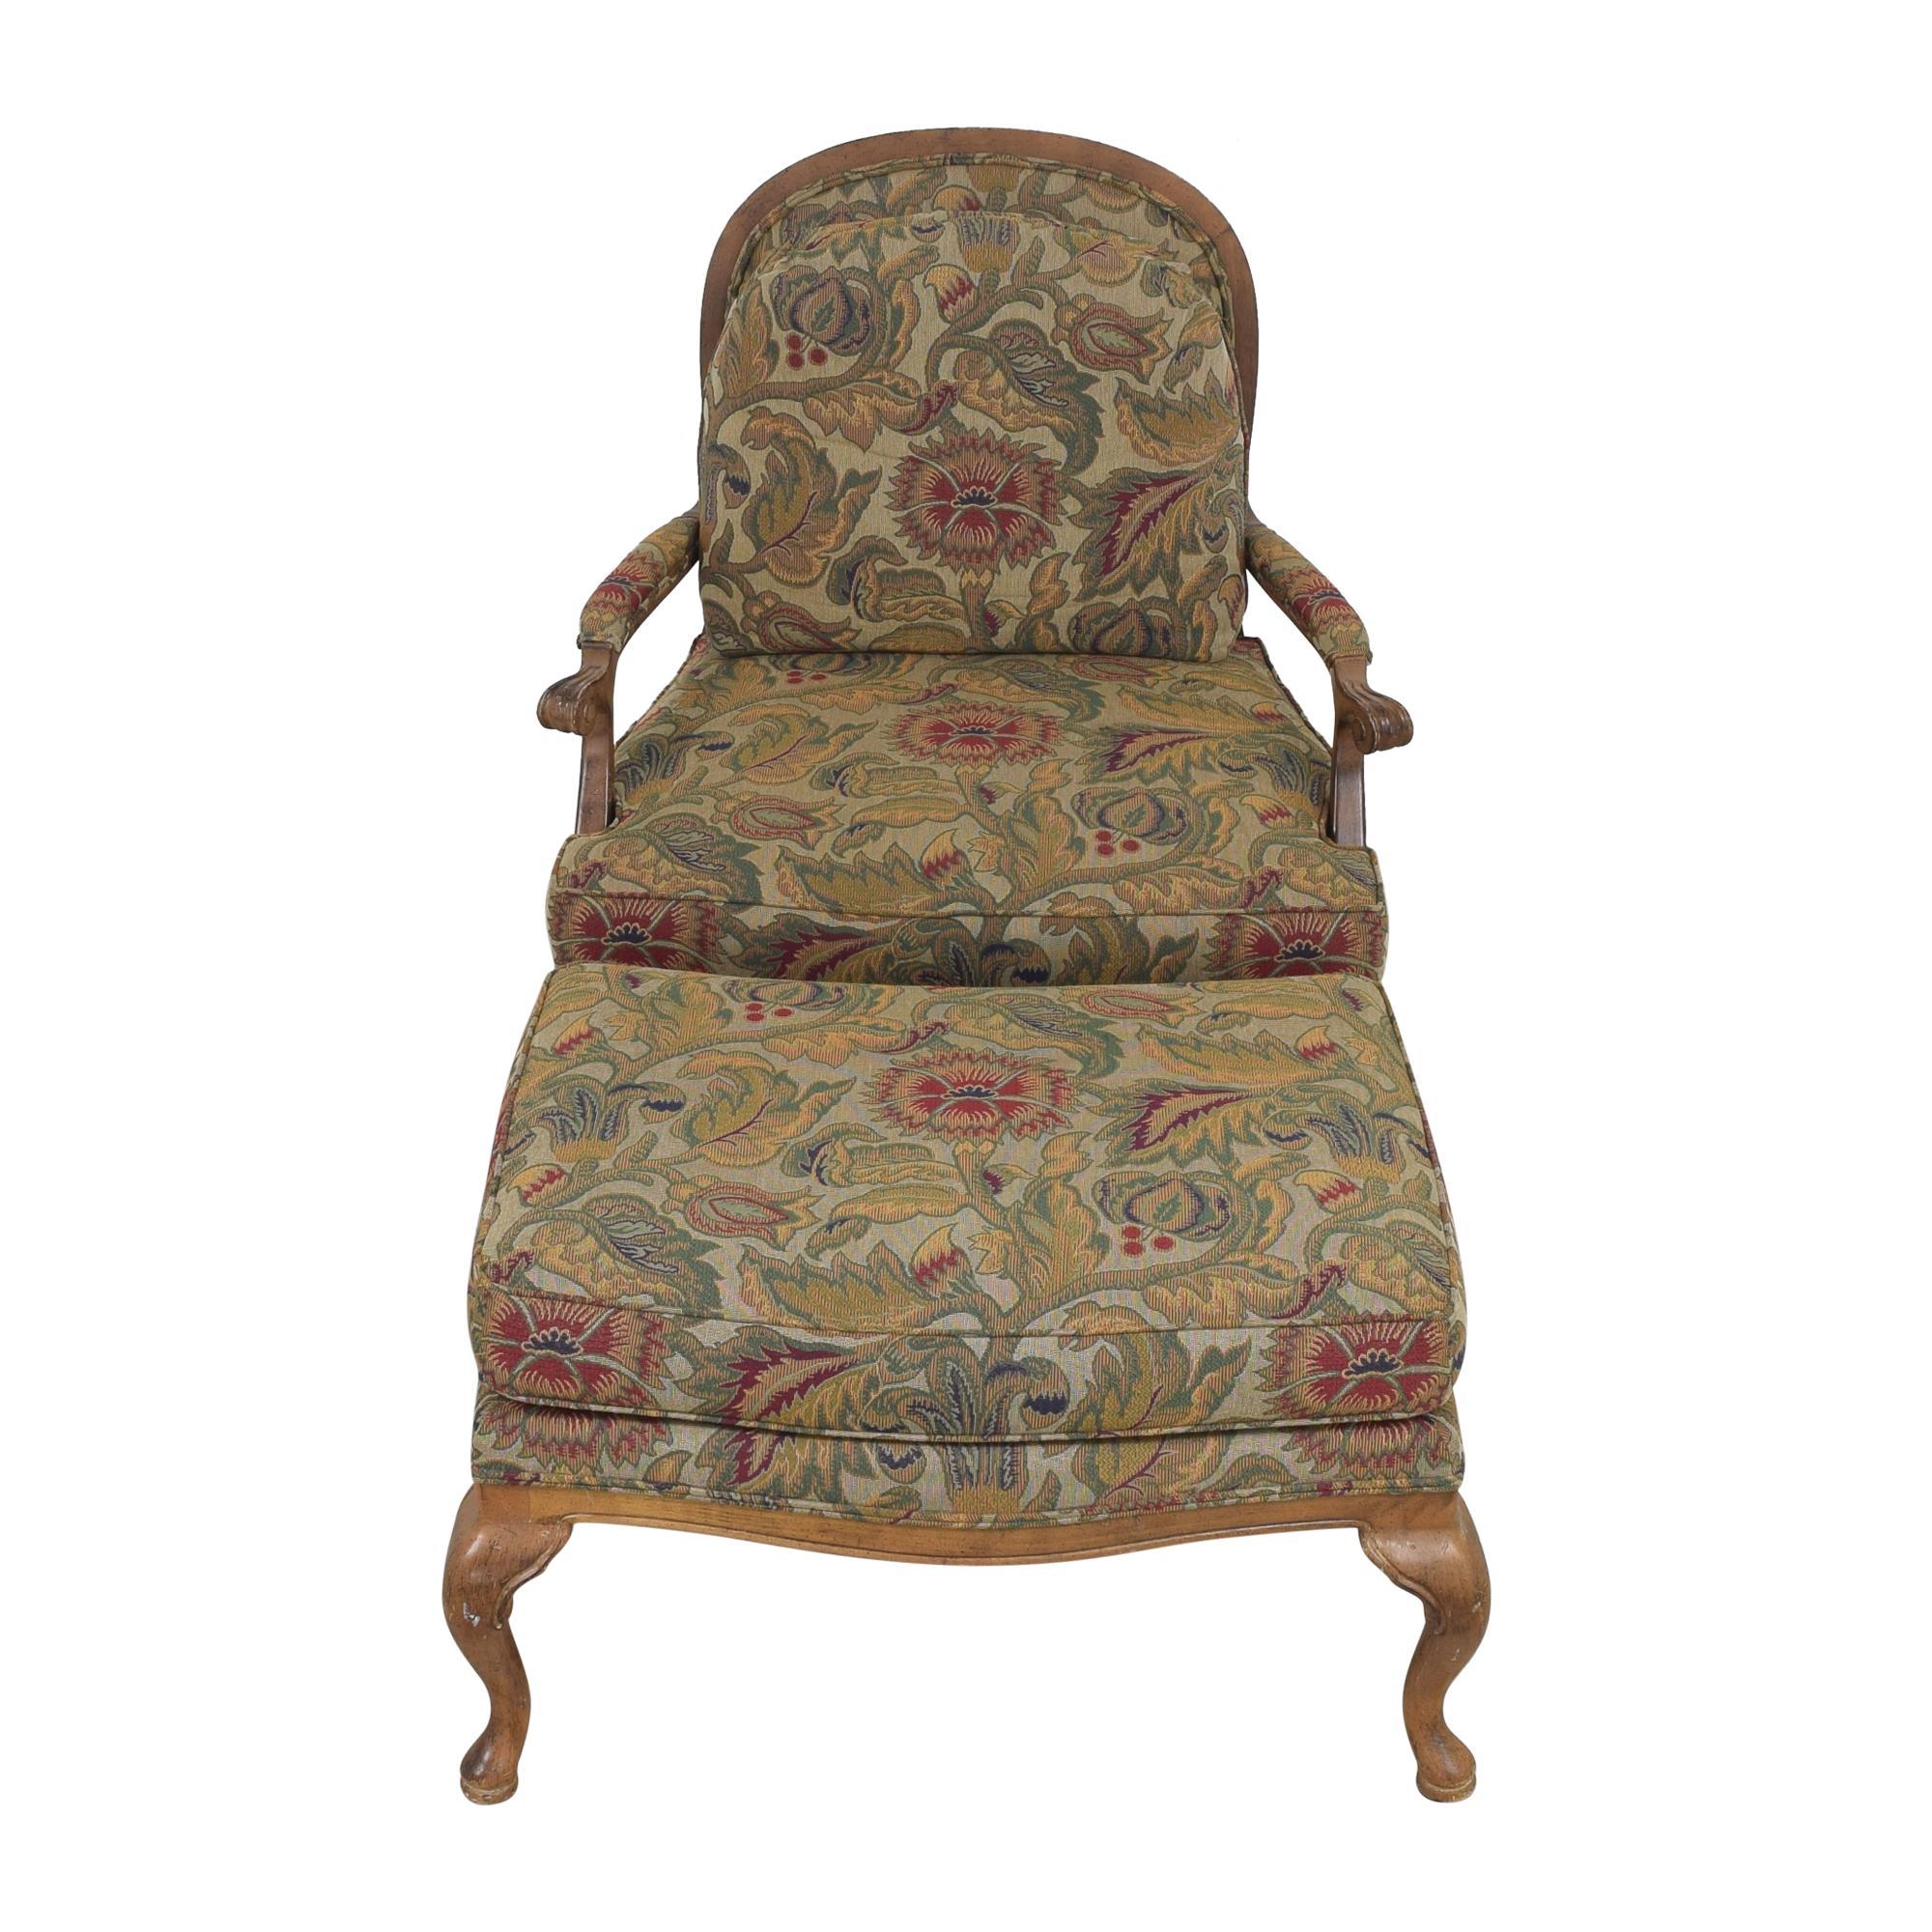 Thomasville Thomasville Bergere Chair and Ottoman price